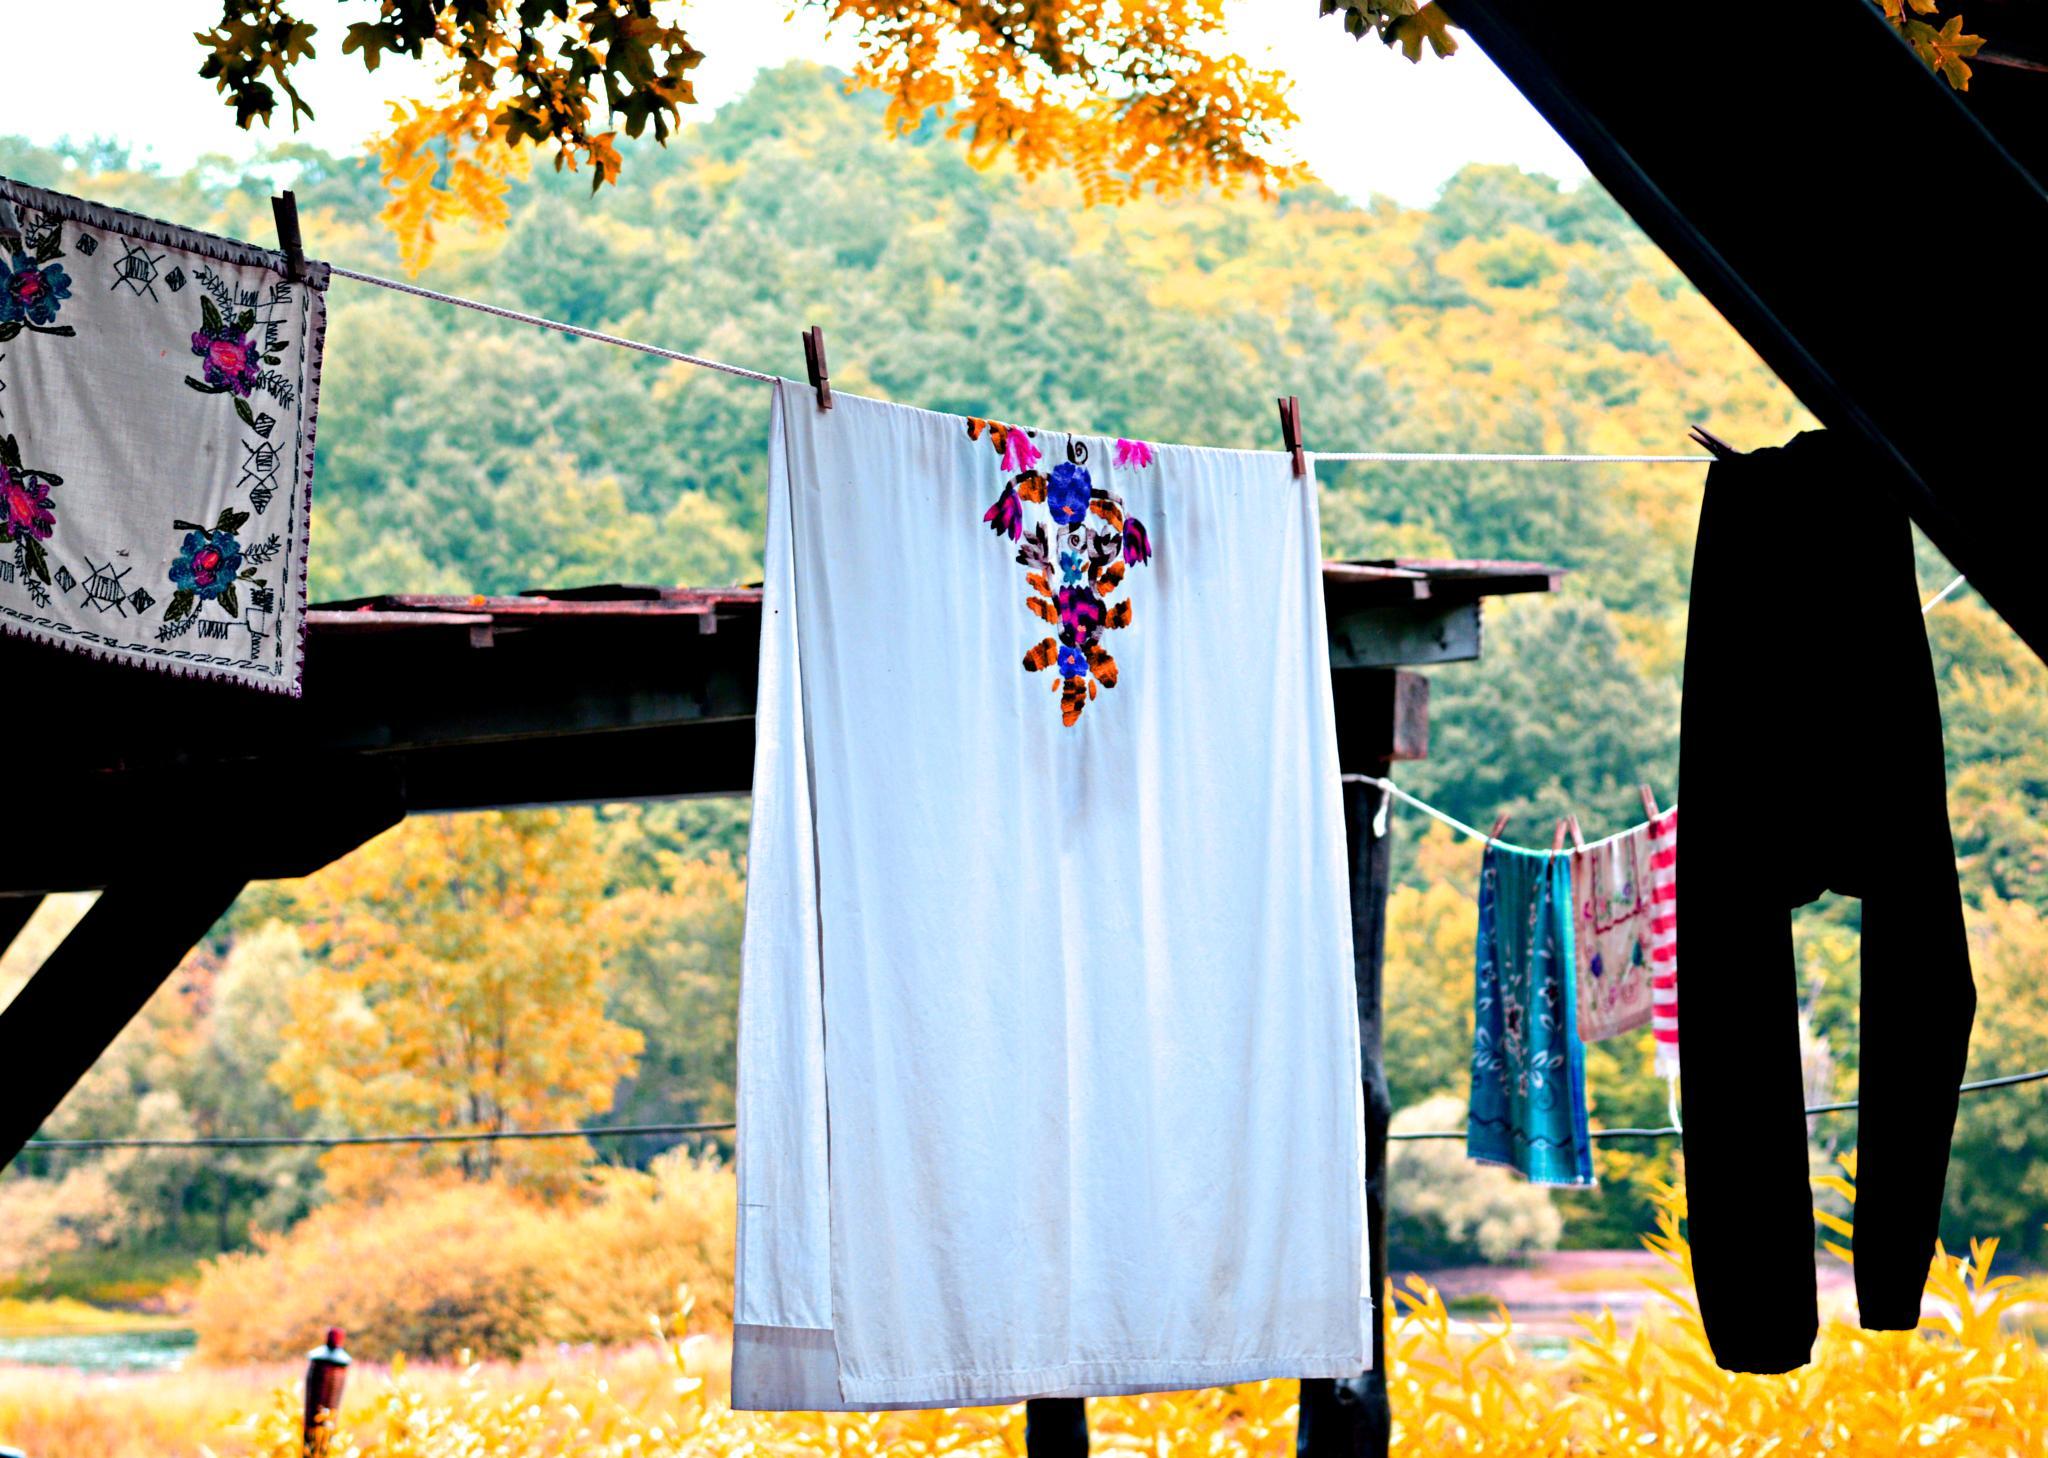 Traditional Clothes by Aida Dzakulic